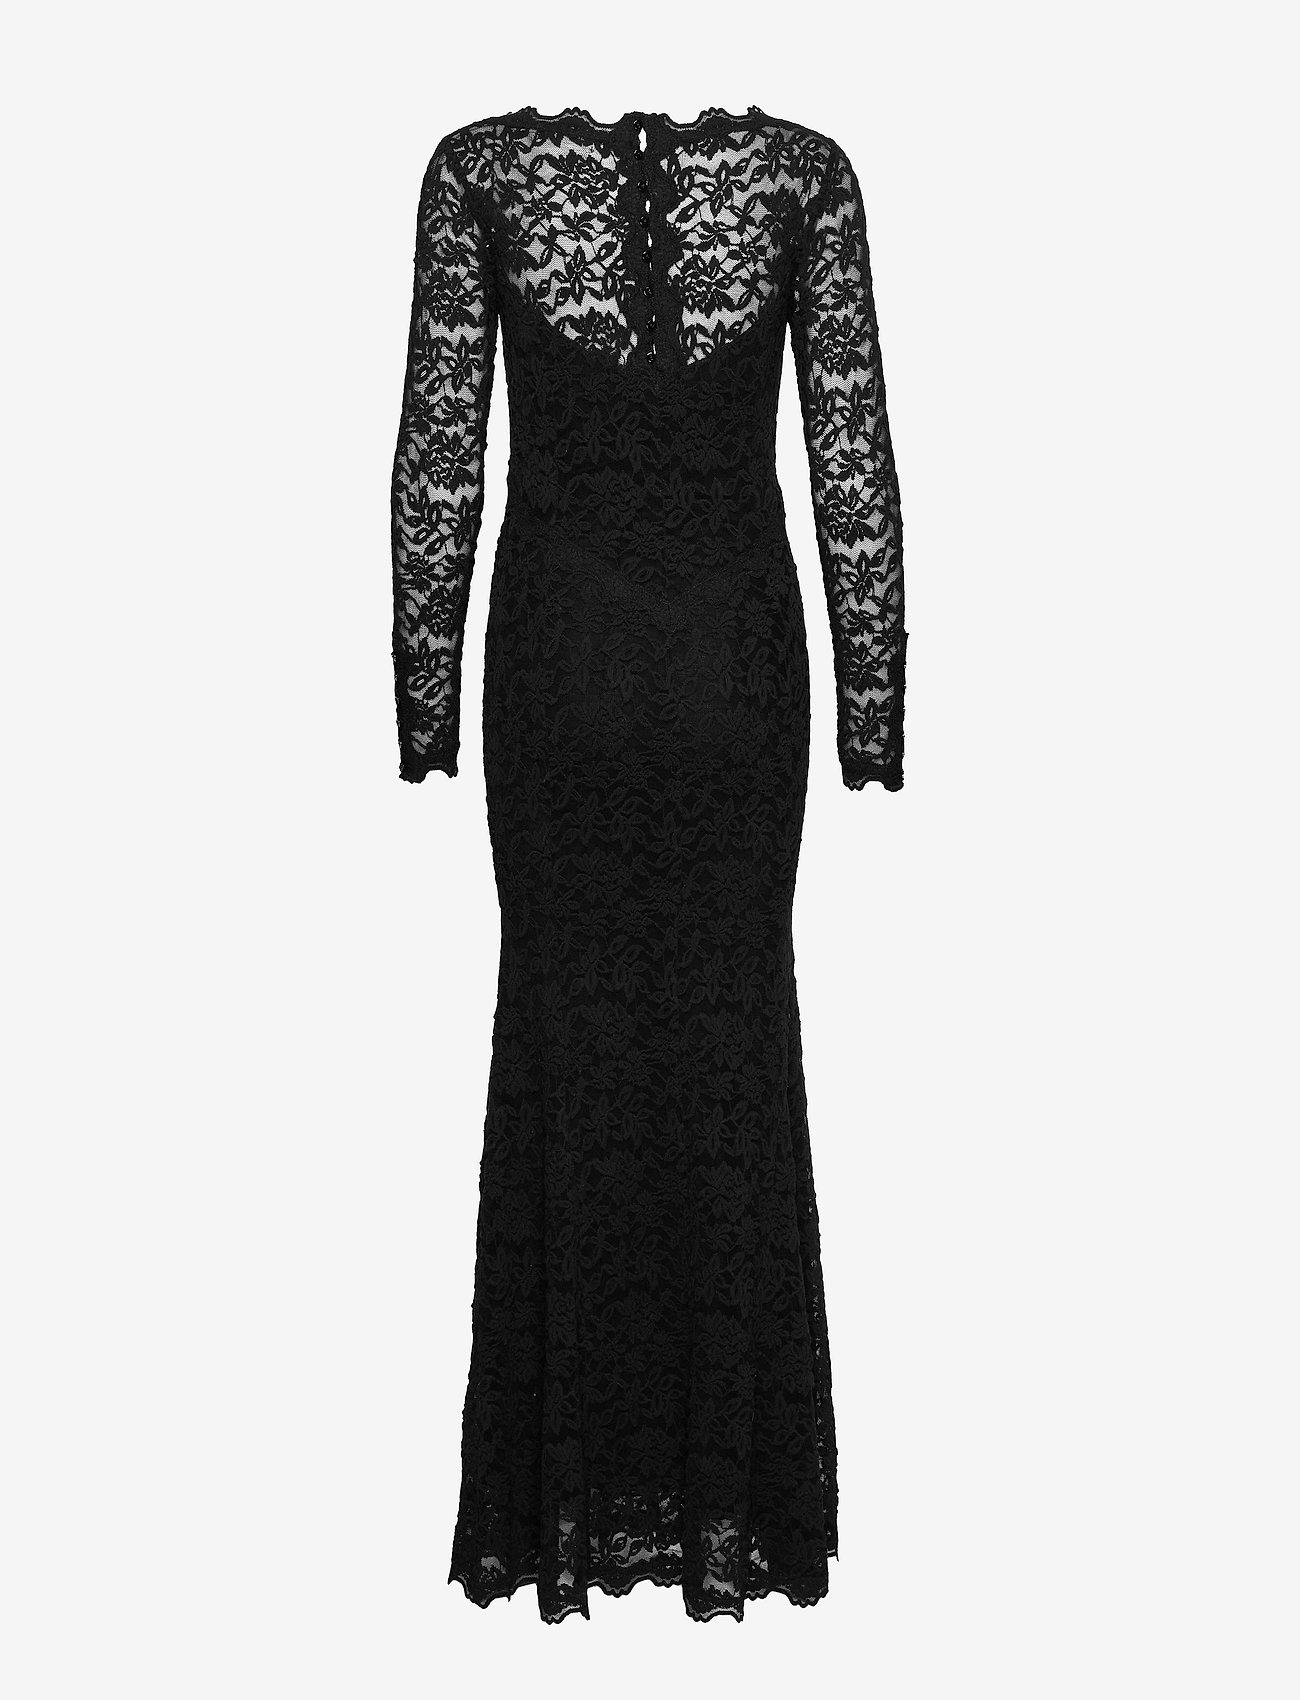 Dress Ls (Black) - Rosemunde y9NBSh